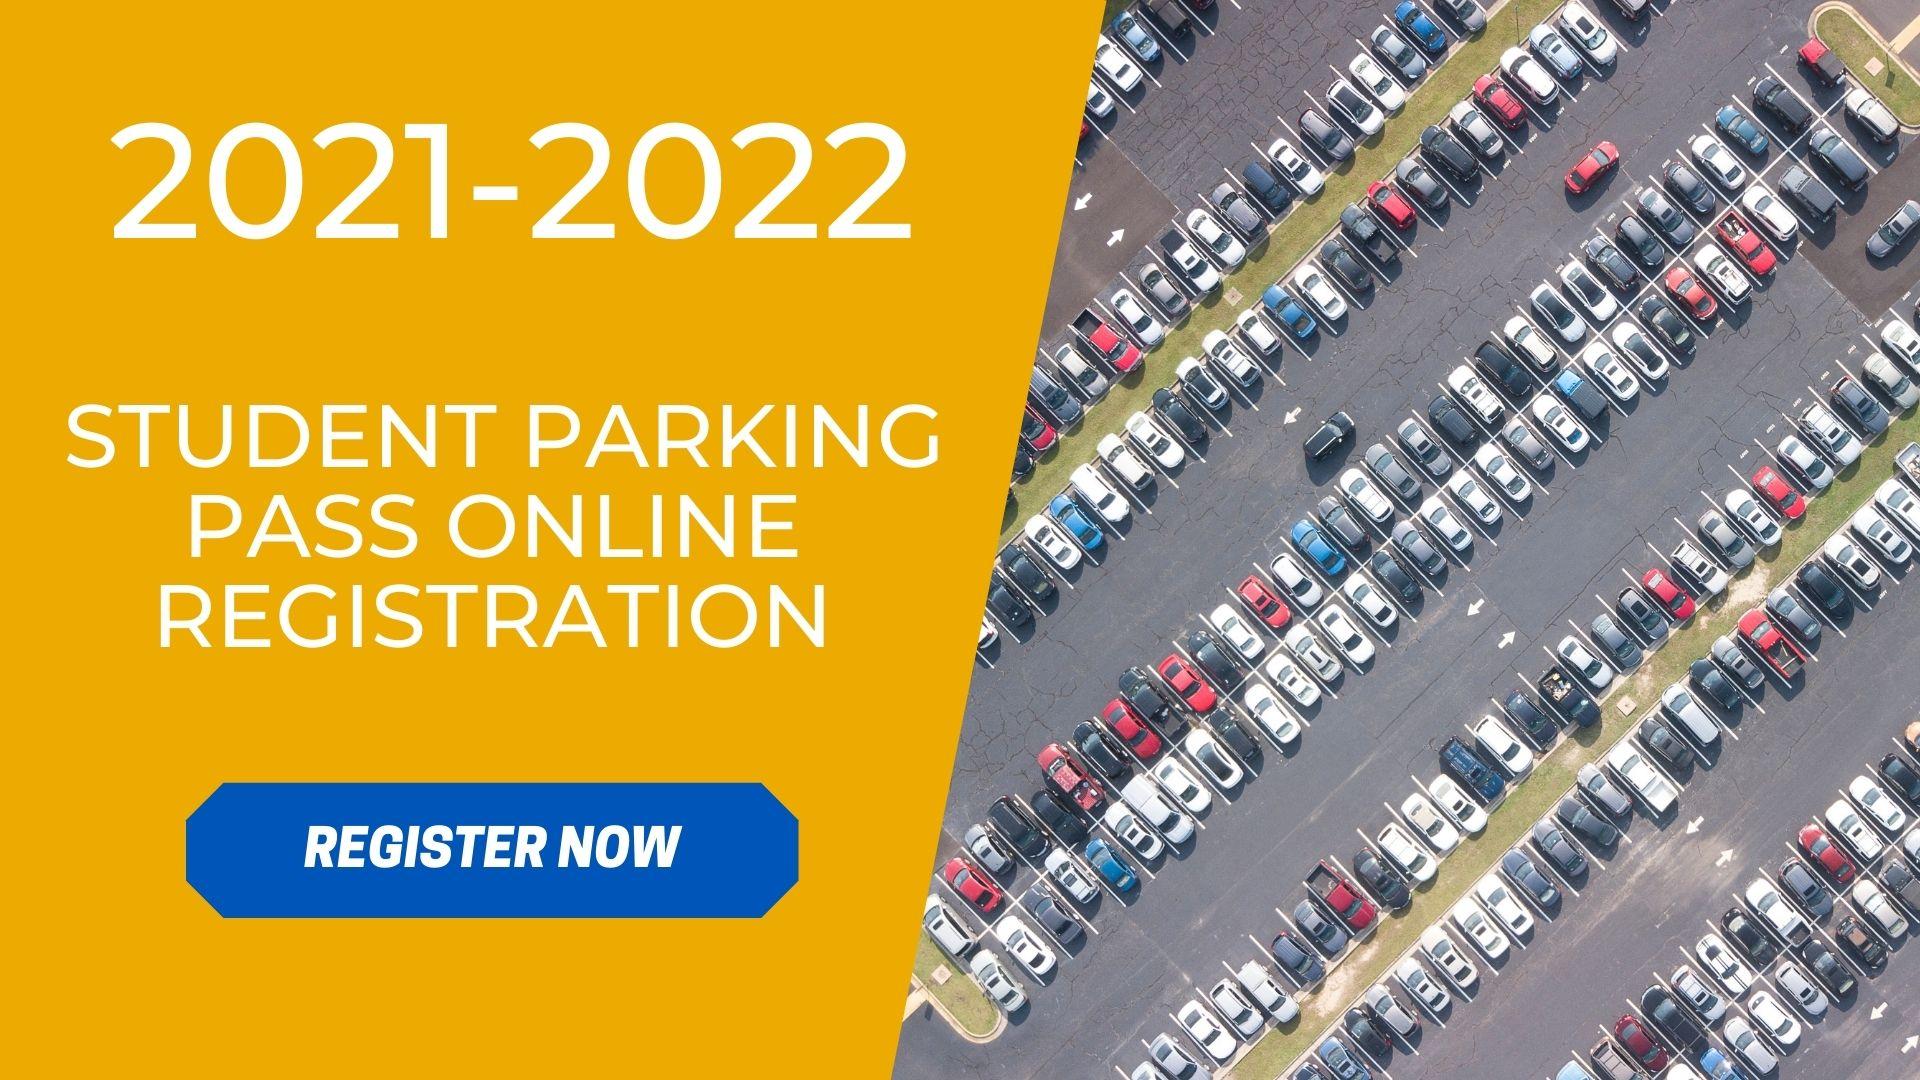 2021-2022 Student Parking Pass Registration